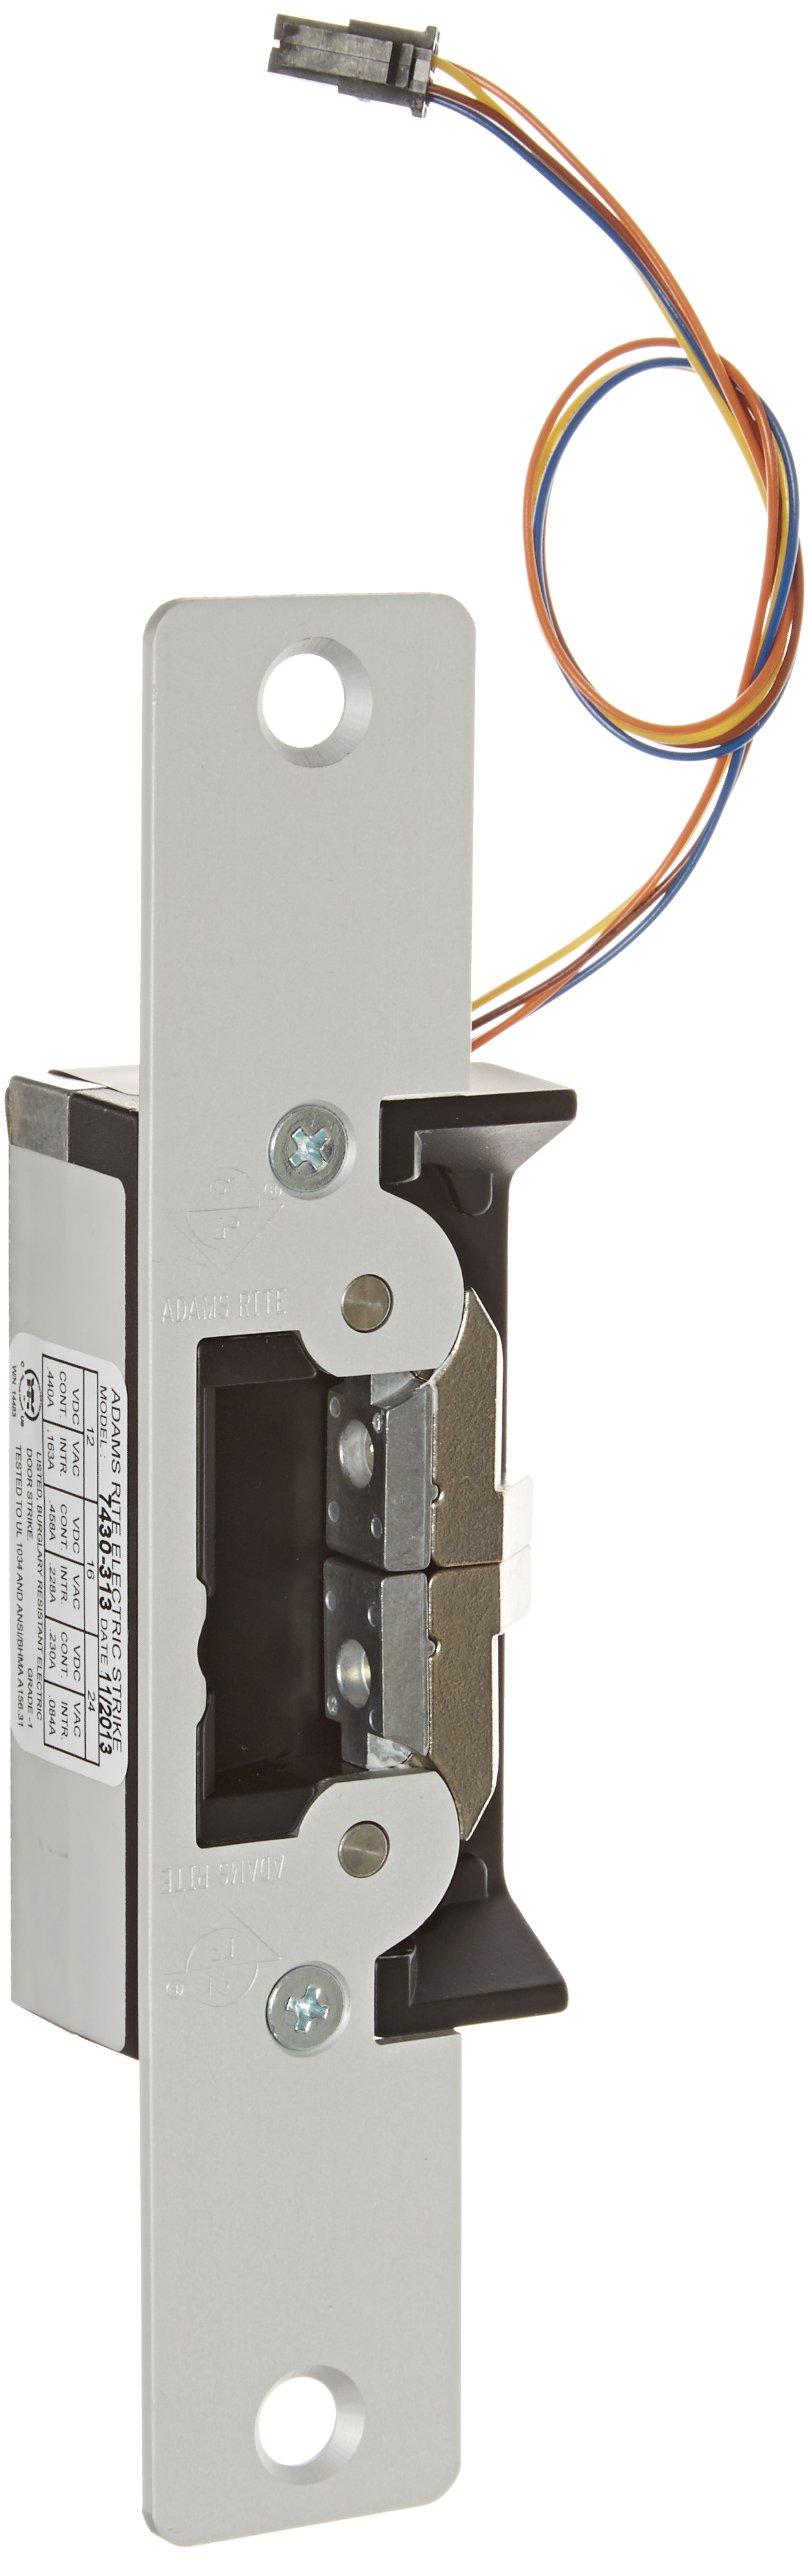 Adams Rite 7430 Series Clear Anodized Zinc Aluminum Alloy UltraLine Electric Strike (Pack of 1)